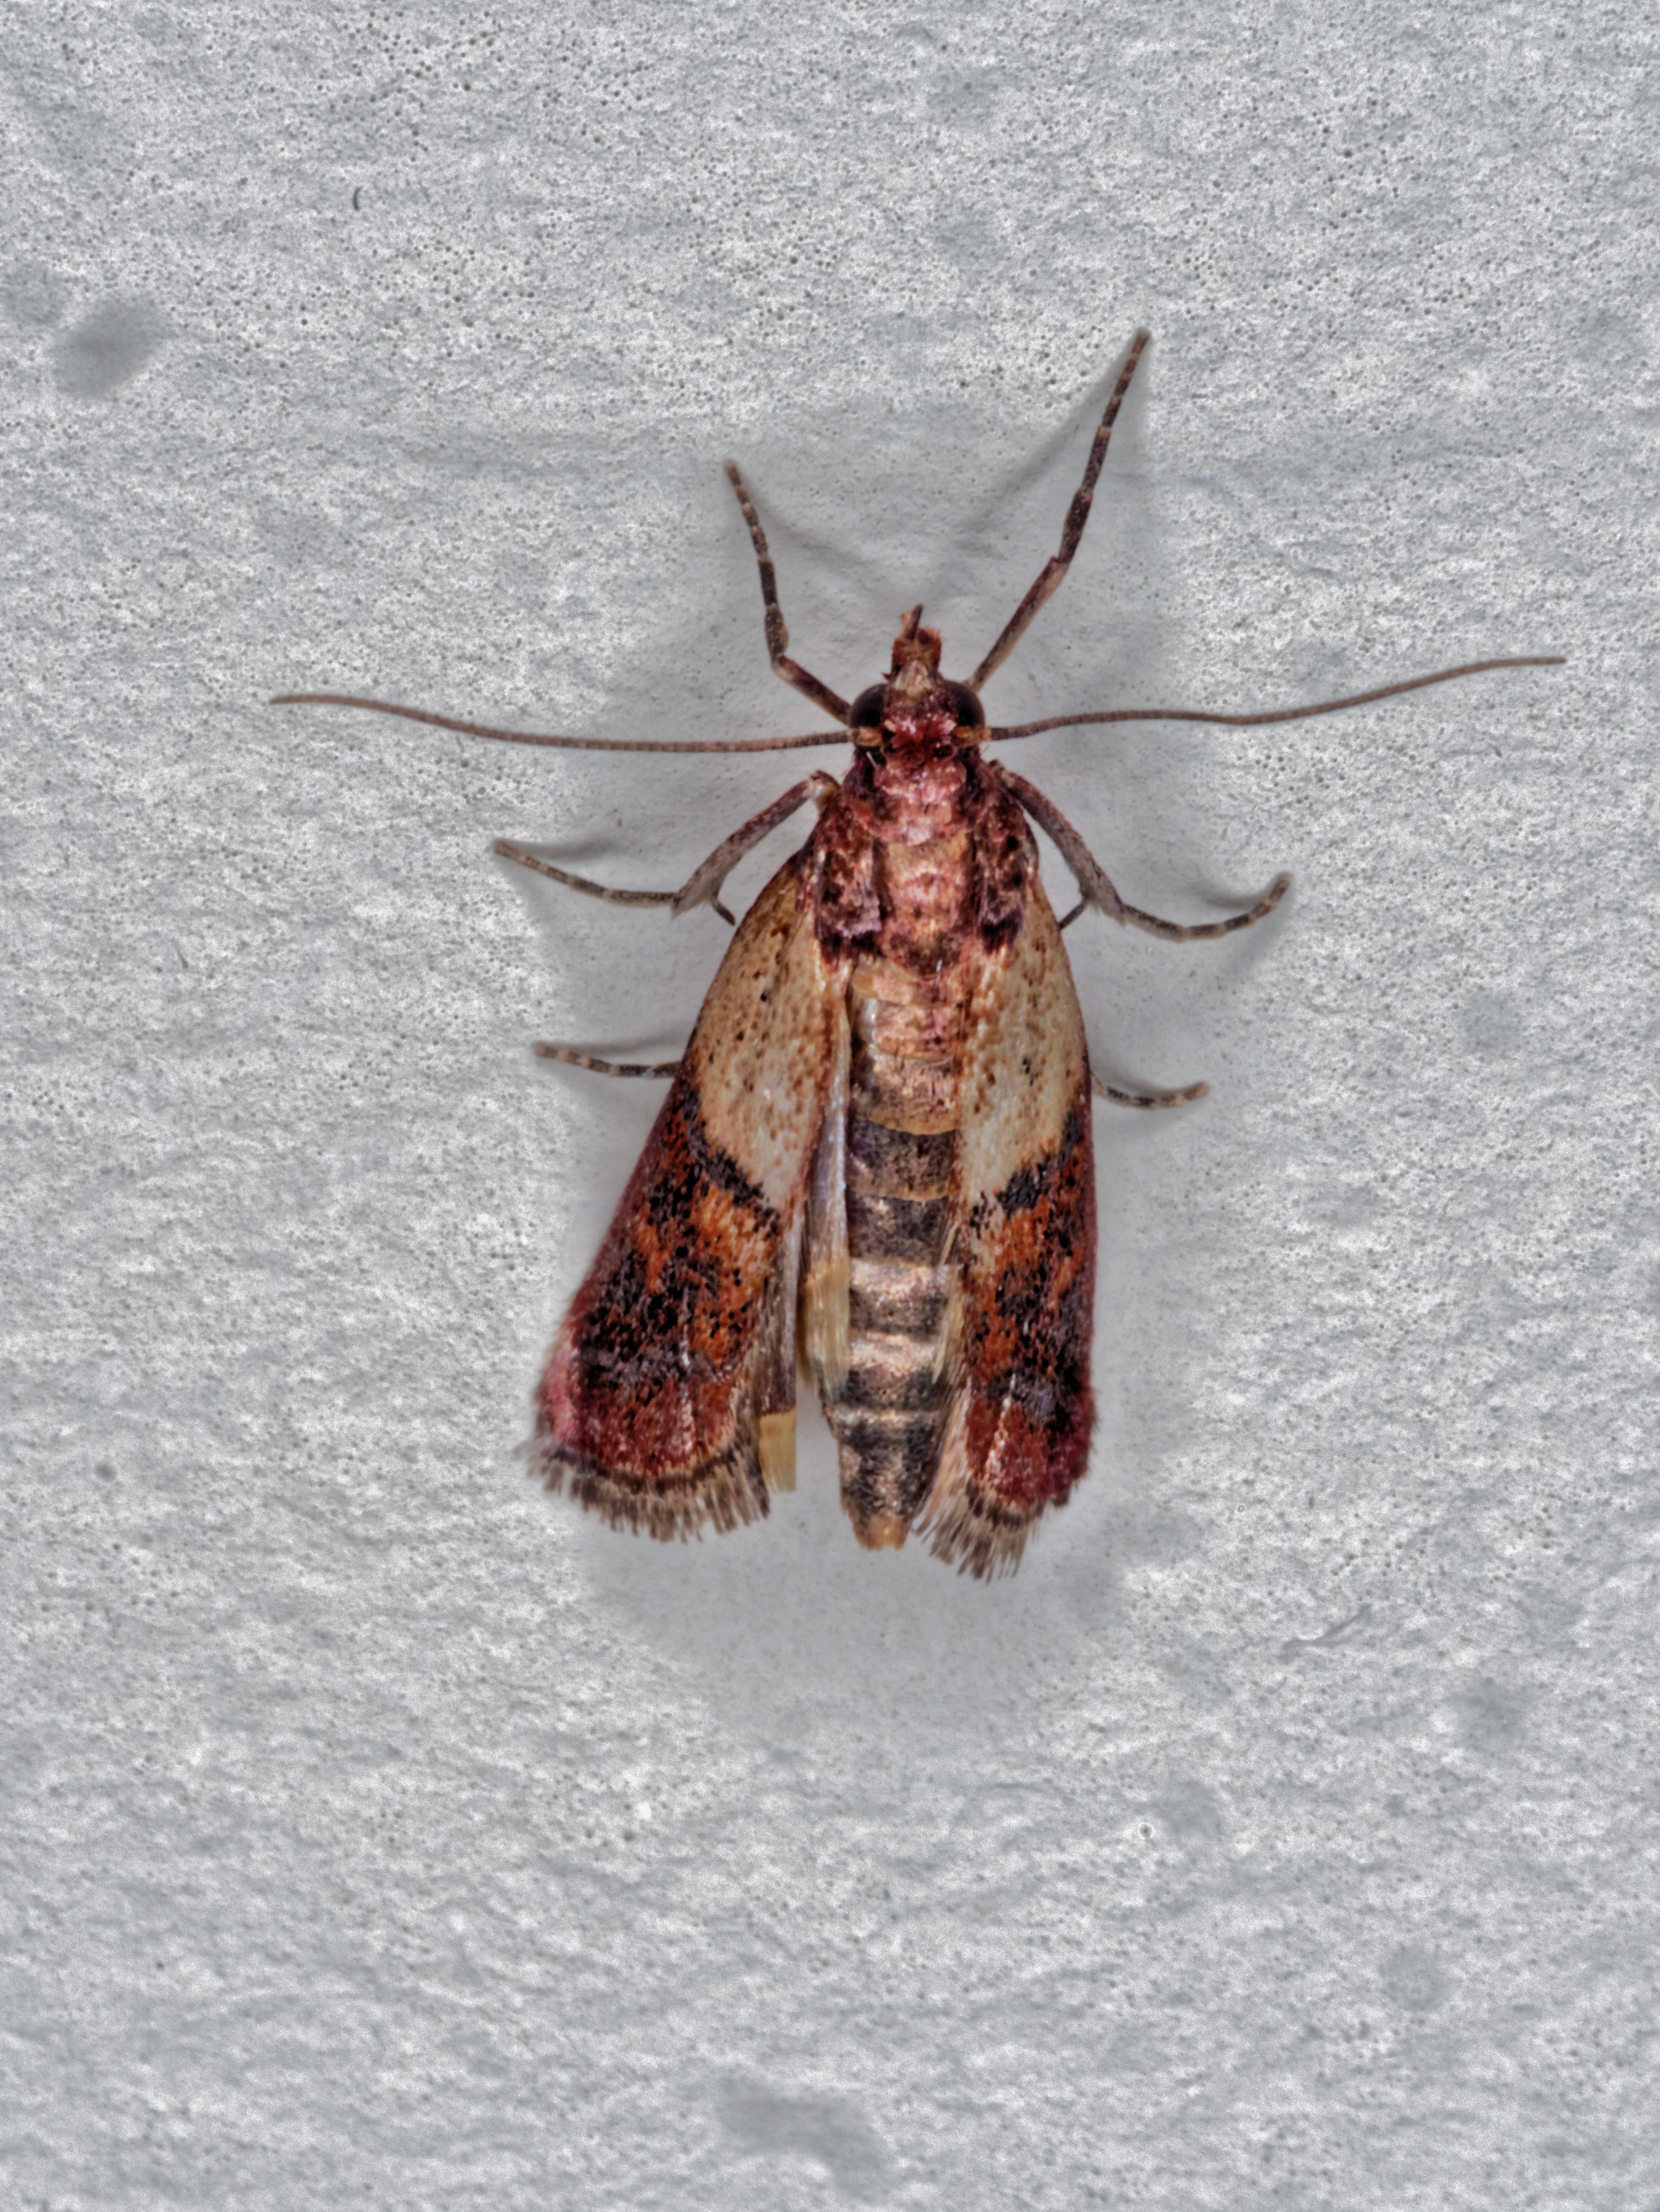 Indianmeal-moth-2.jpeg